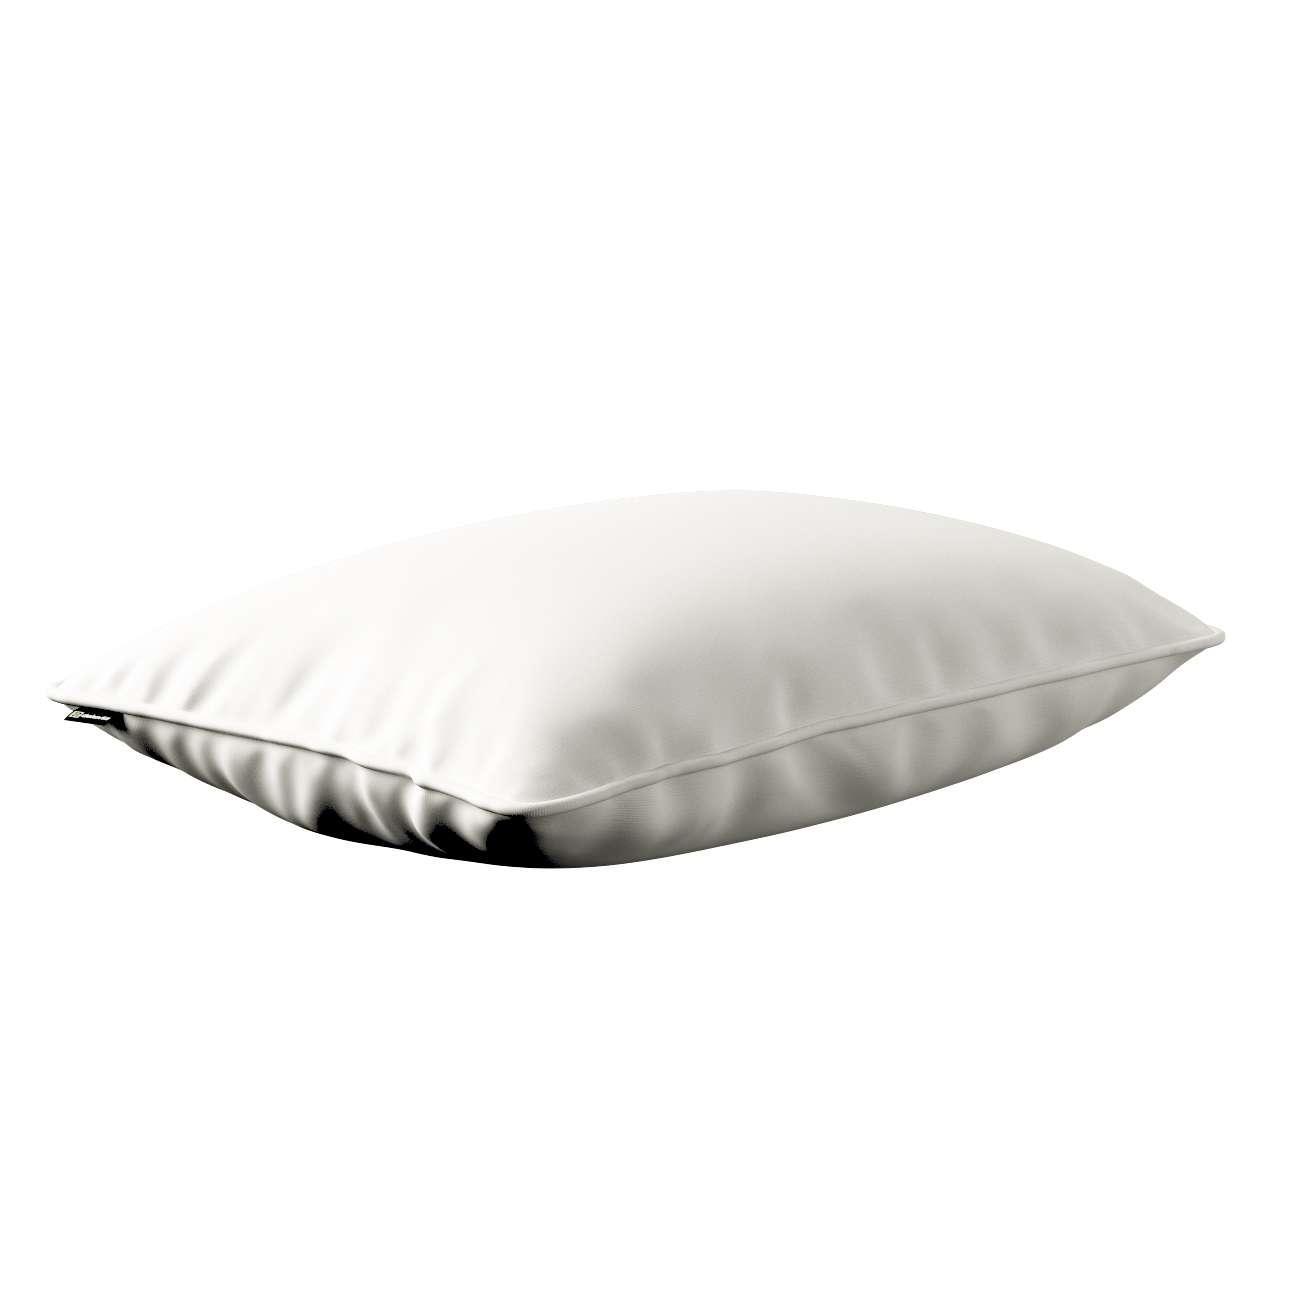 Gabi - potah na polštář šňůrka po obvodu obdélníkový v kolekci Cotton Panama, látka: 702-34